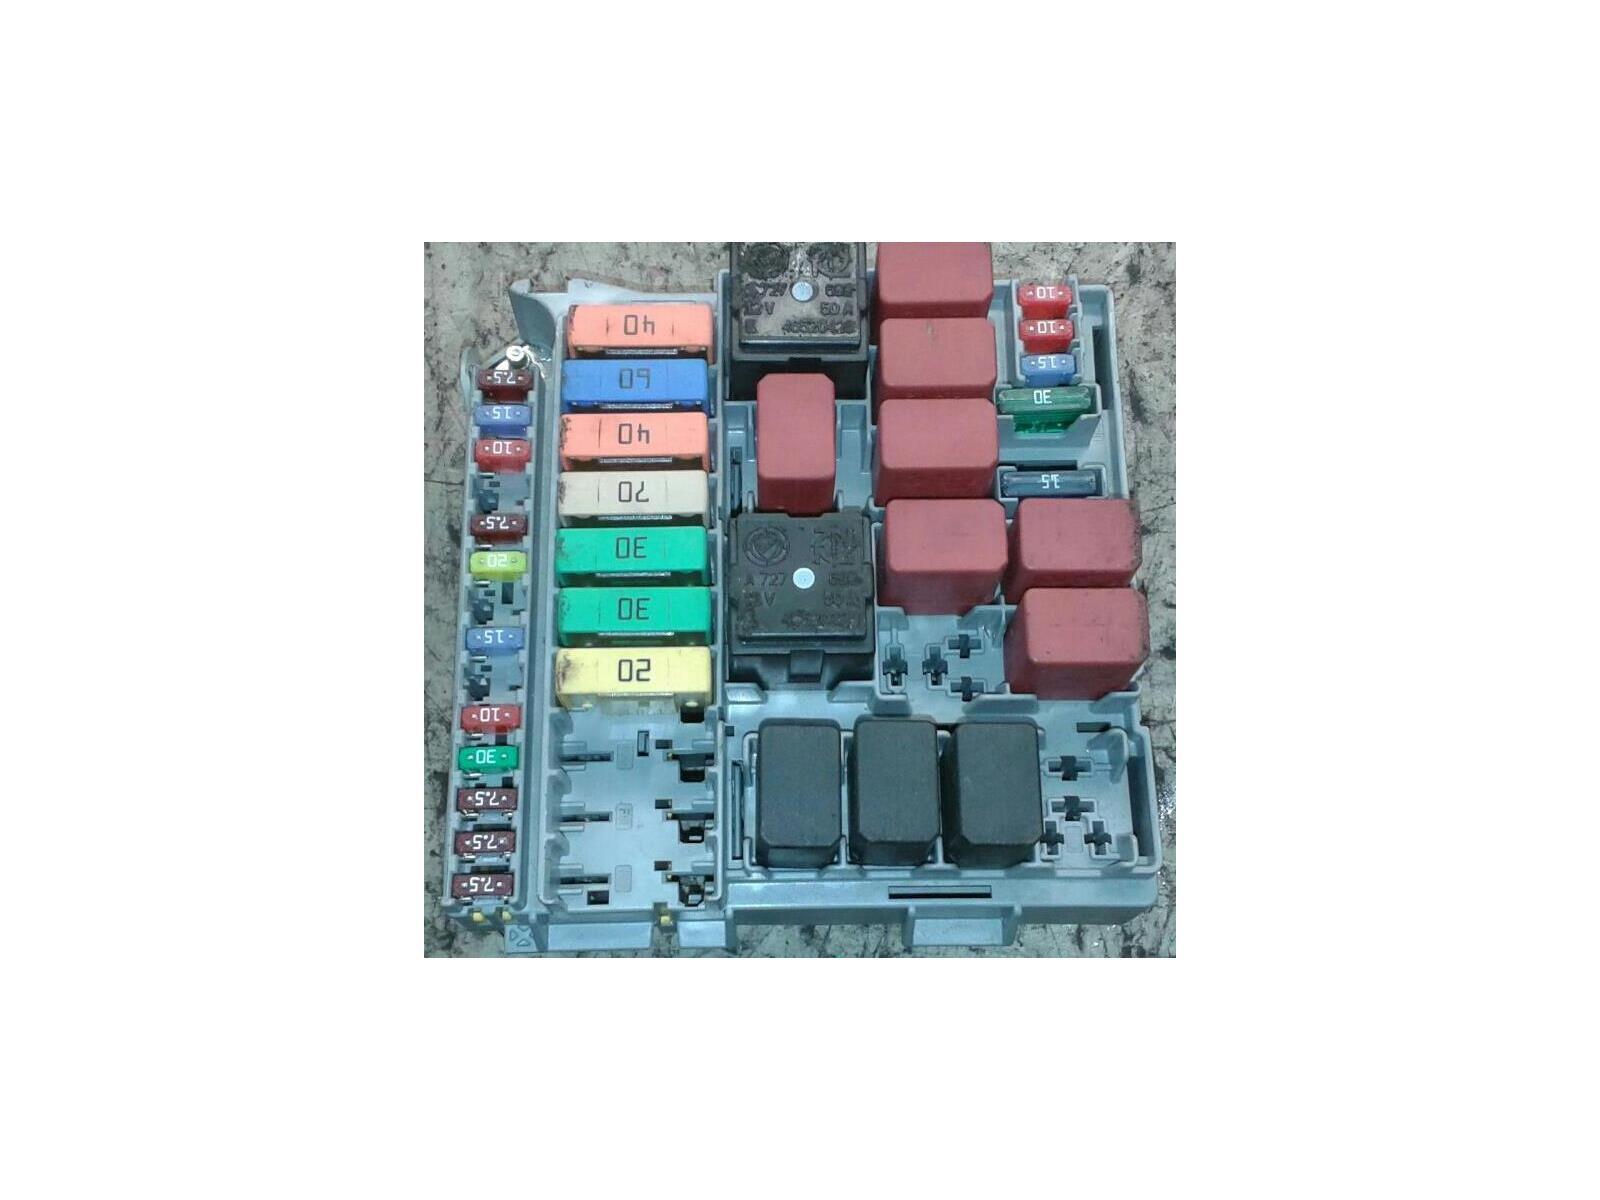 hight resolution of 2015 fiat 500 fuse box wiring diagram 2015 fiat 500 fuse box